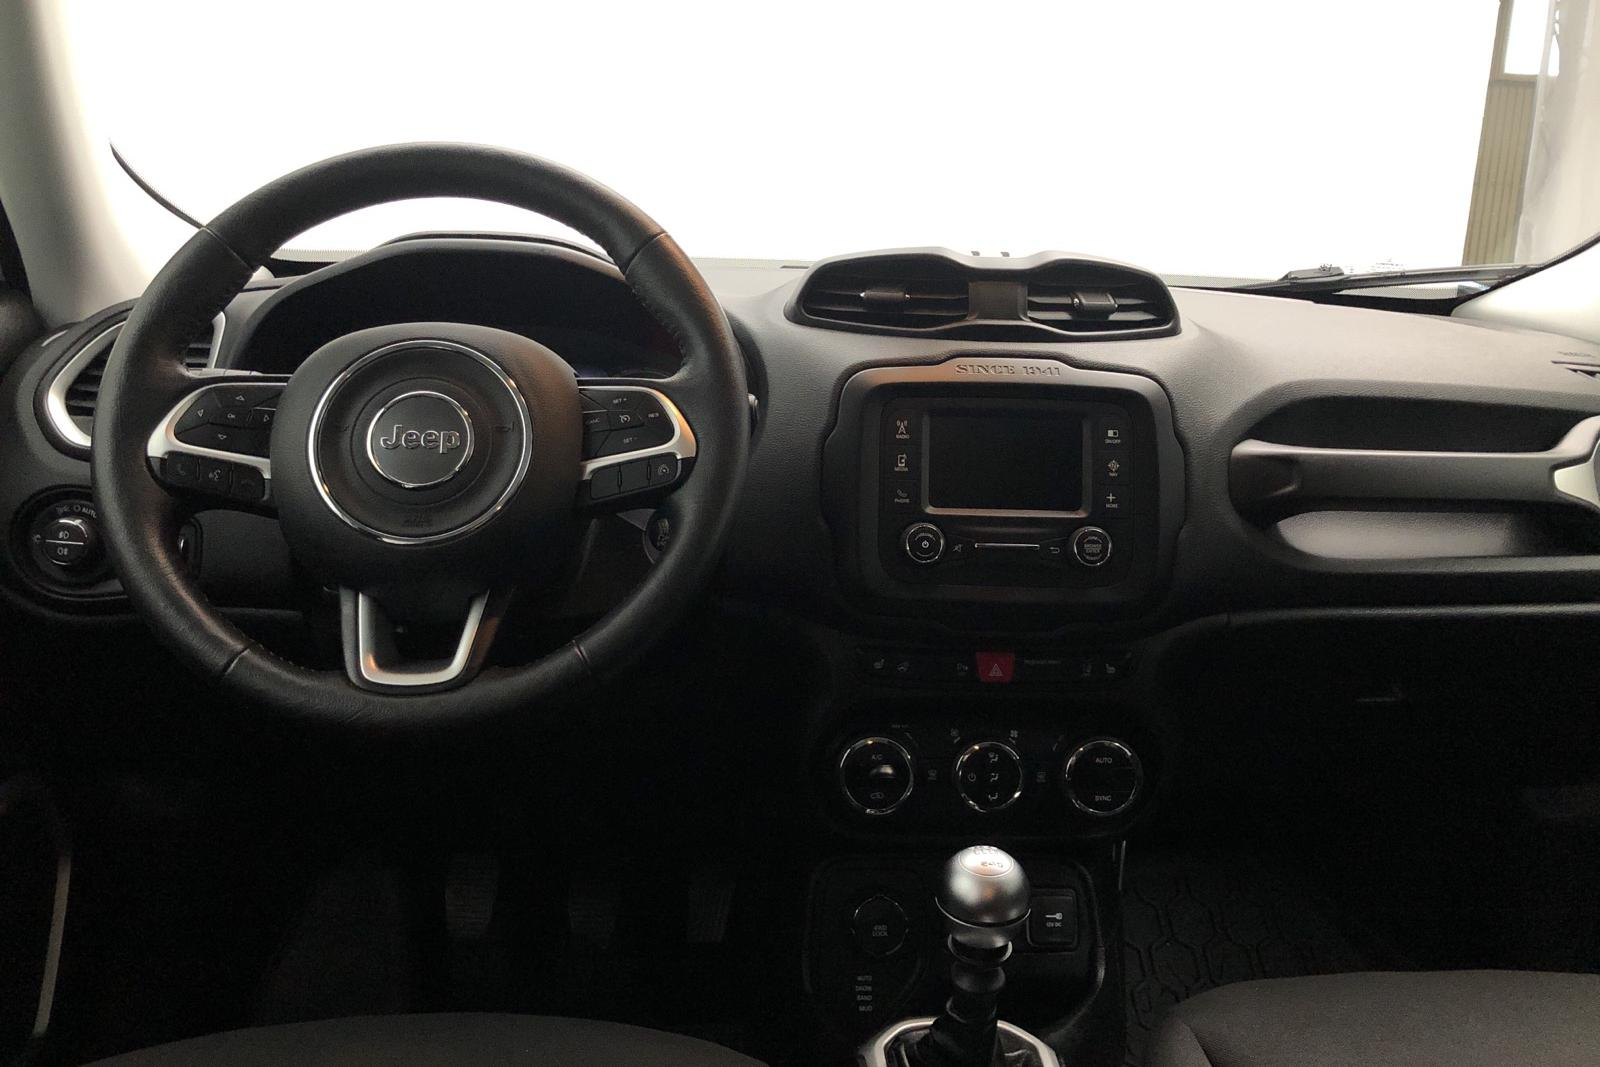 Jeep Renegade 2.0 MultiJet 4WD (140hk) - 2 583 mil - Manuell - vit - 2015